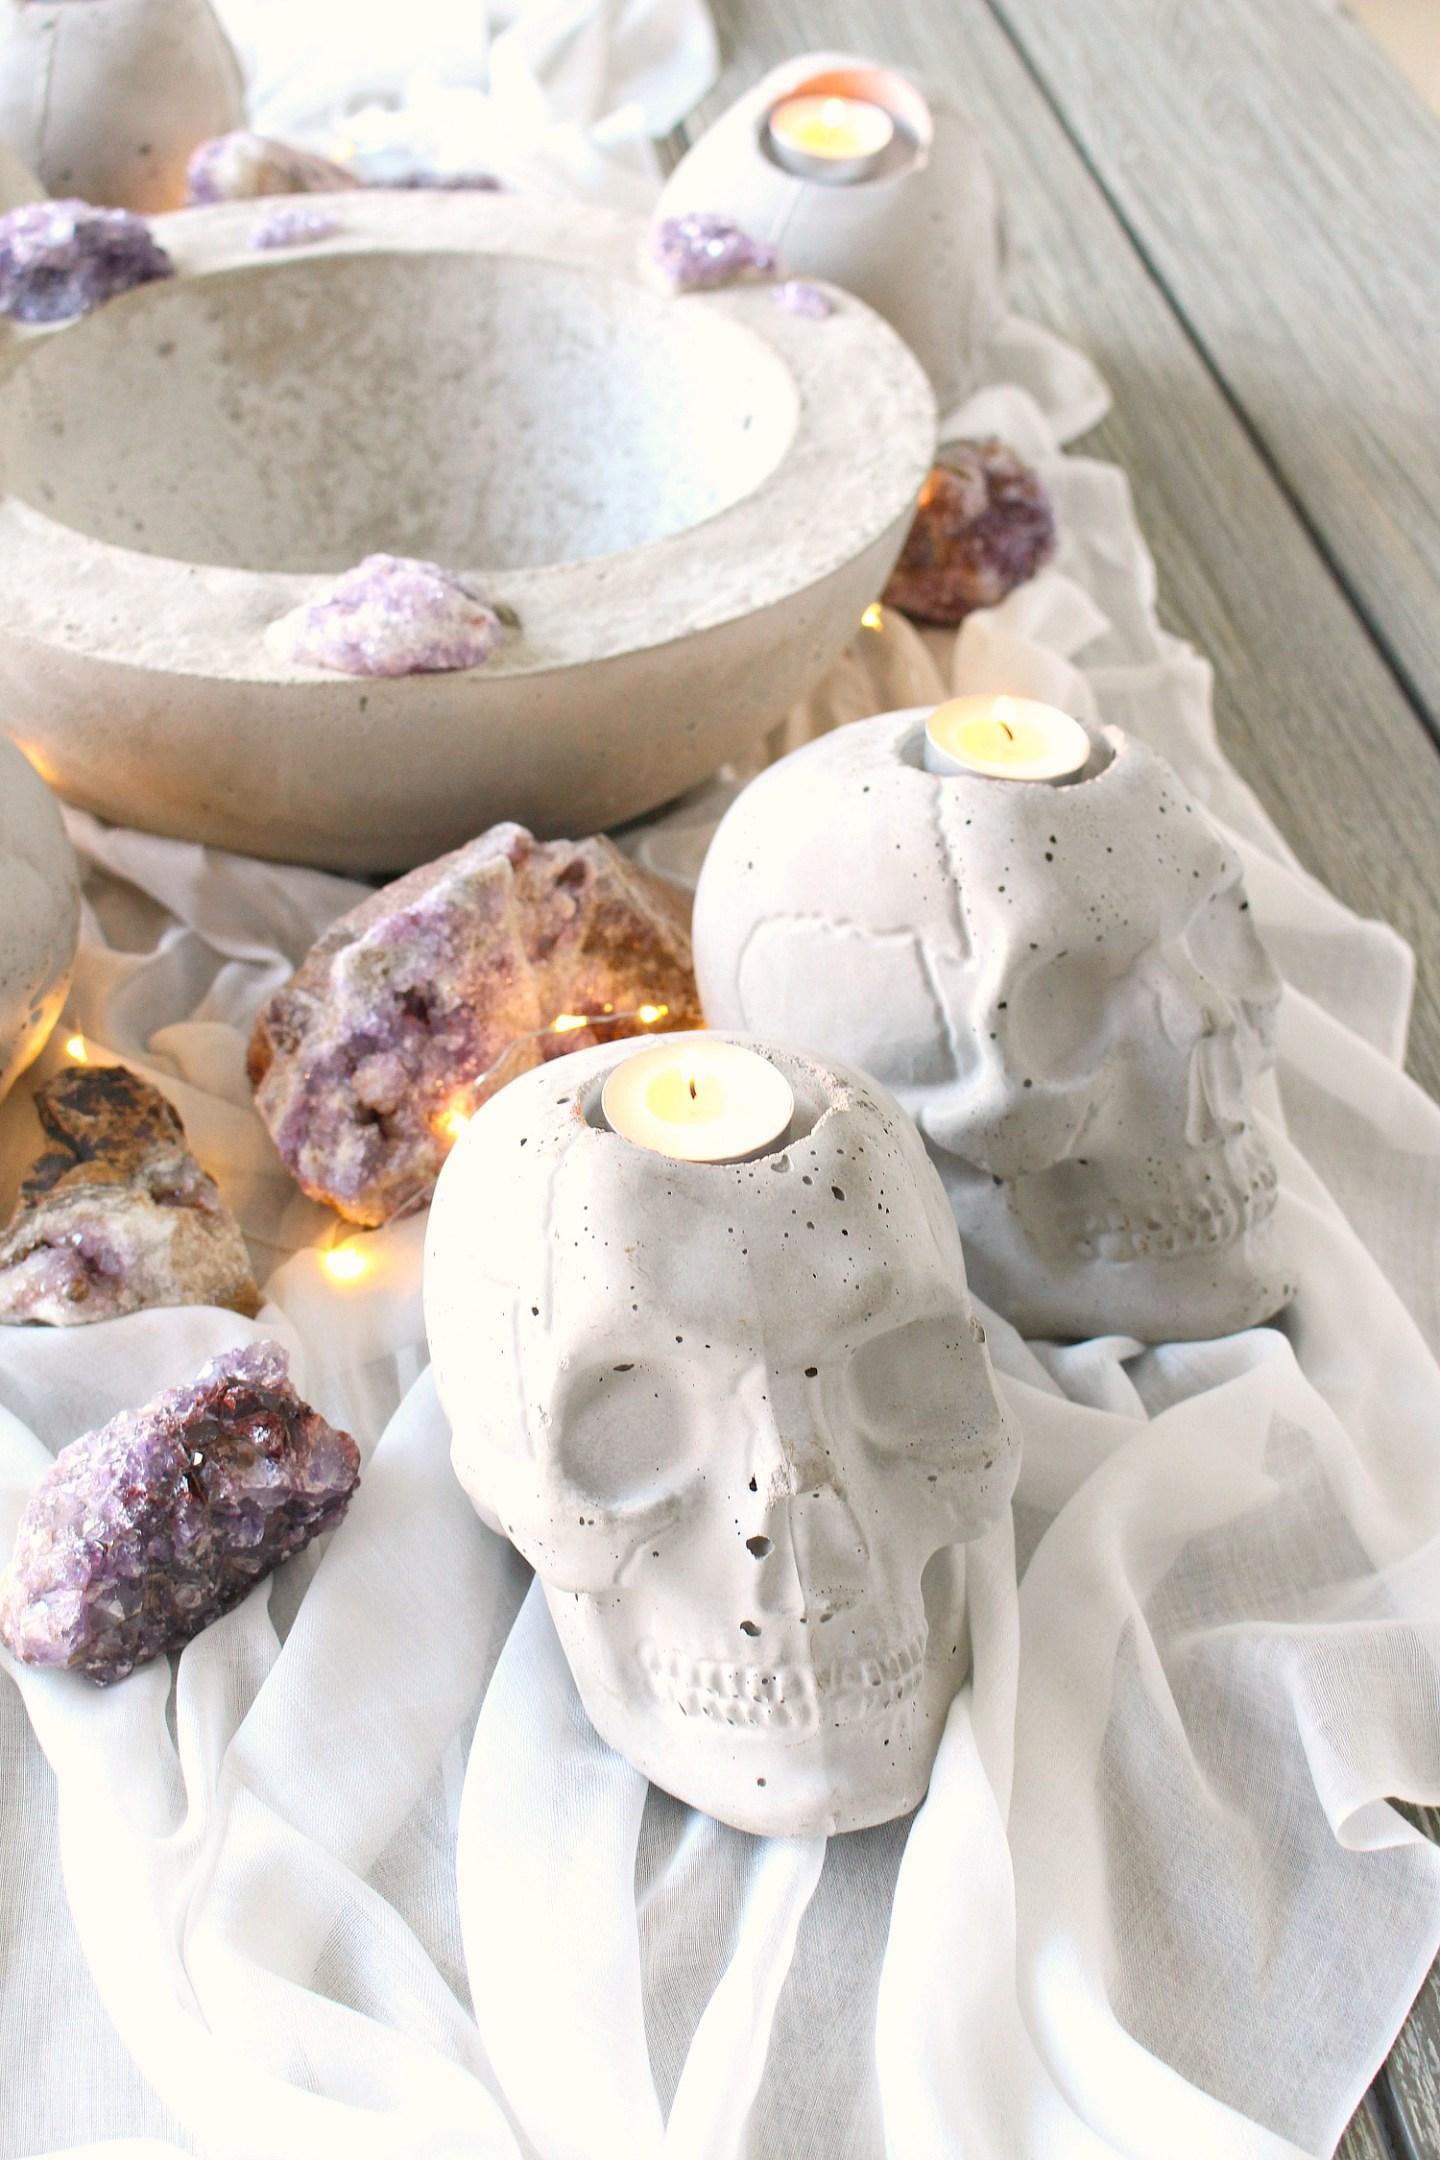 How to Make a Concrete Skull